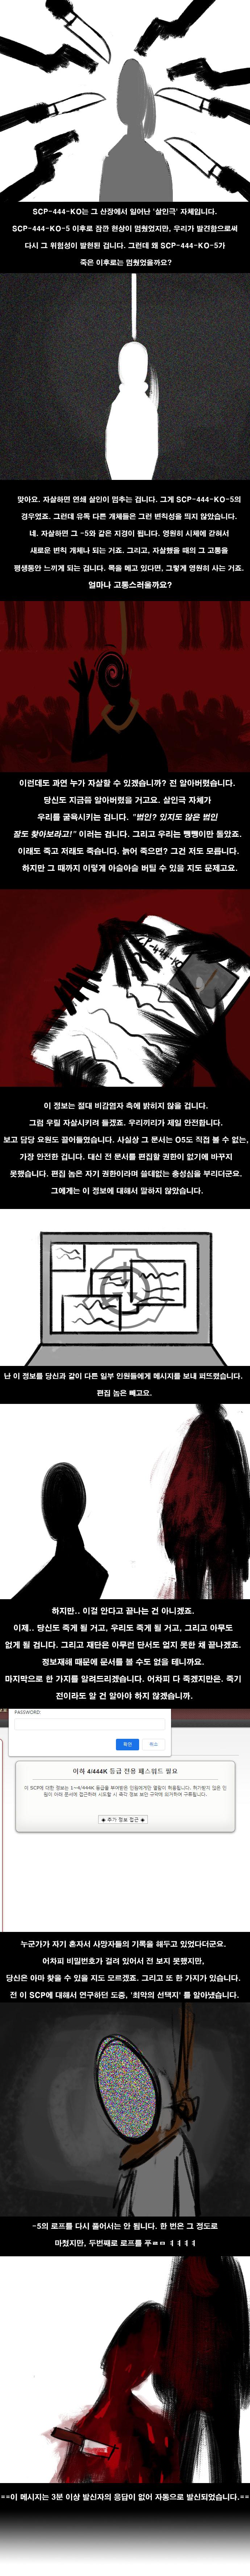 viewimage.php?id=3ebec020eac736a26fabdfba18&no=24b0d769e1d32ca73dec8ffa11d02831046ced35d9c2bd23e7054e3c2d8467a87d44ee719b7b7c53f589e895e6e477d27ded9ae80c6a635872c836288f0ea6d3371a0b6ec478fe2f